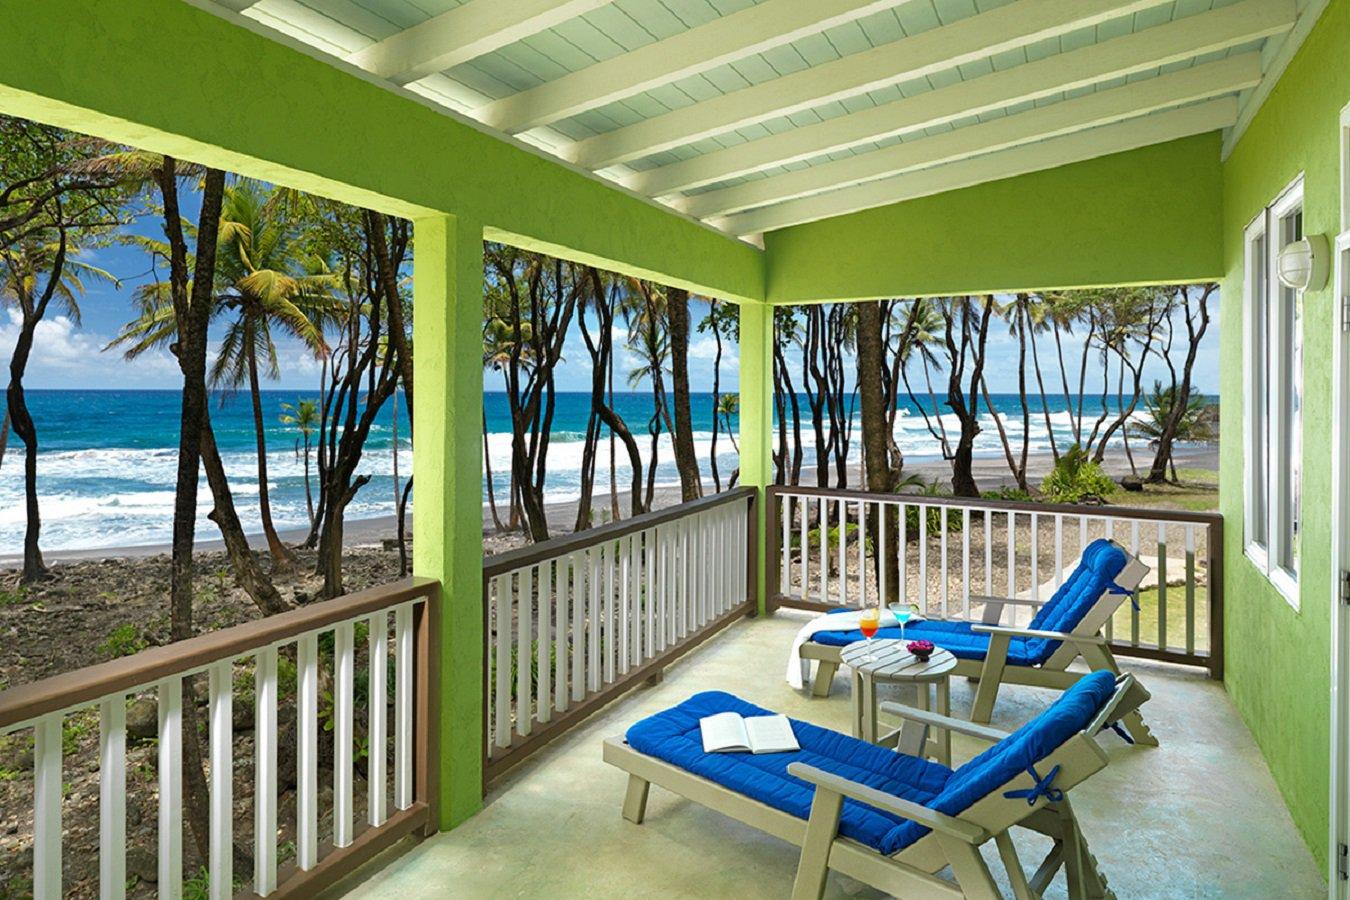 Rosalie Bay Resort SakaFete Campaign